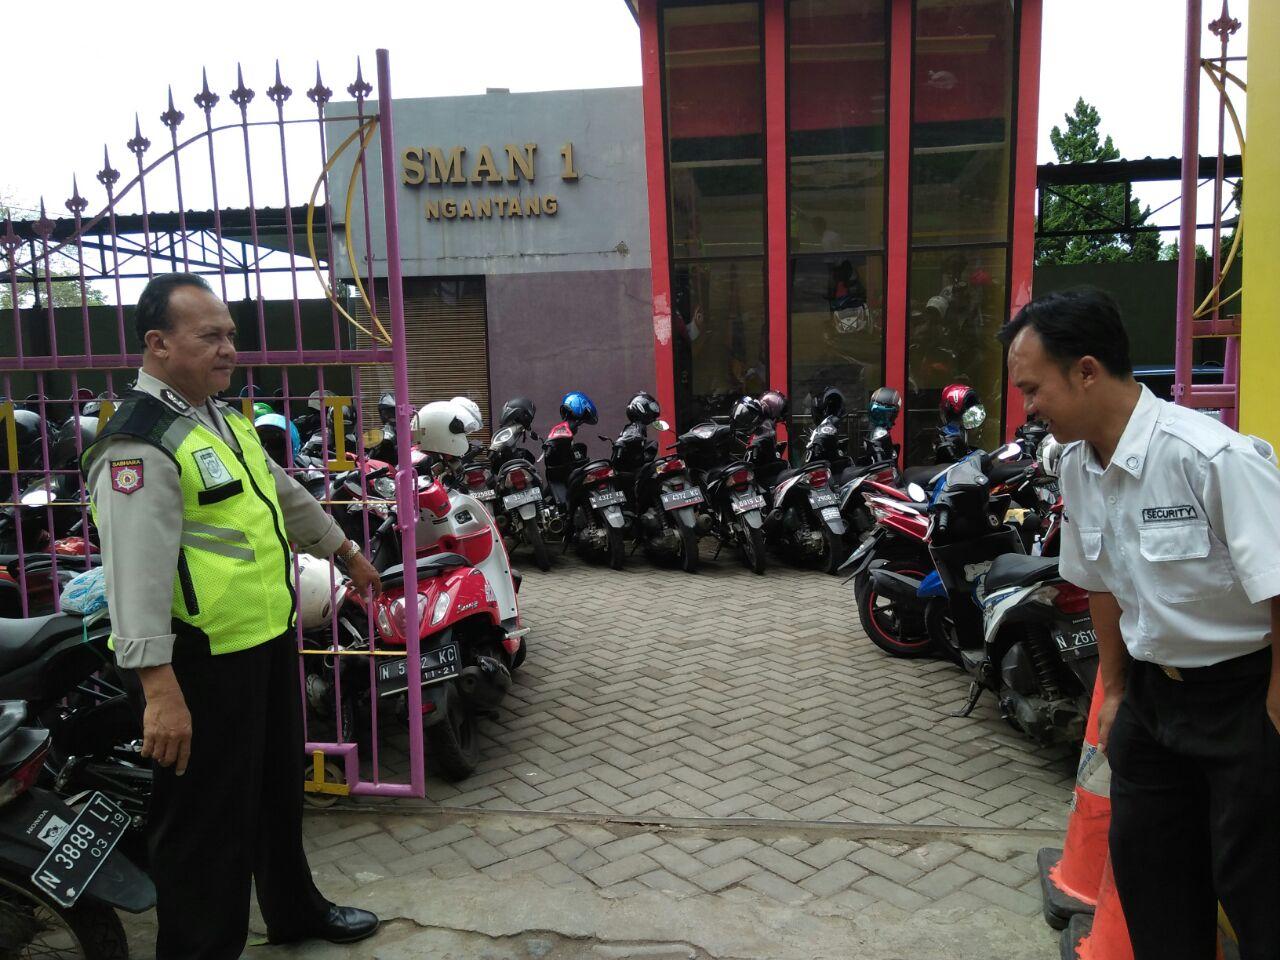 Anggota Polsek Ngantang Polres Batu Bertatap muka Dengan Patroli Dialogis